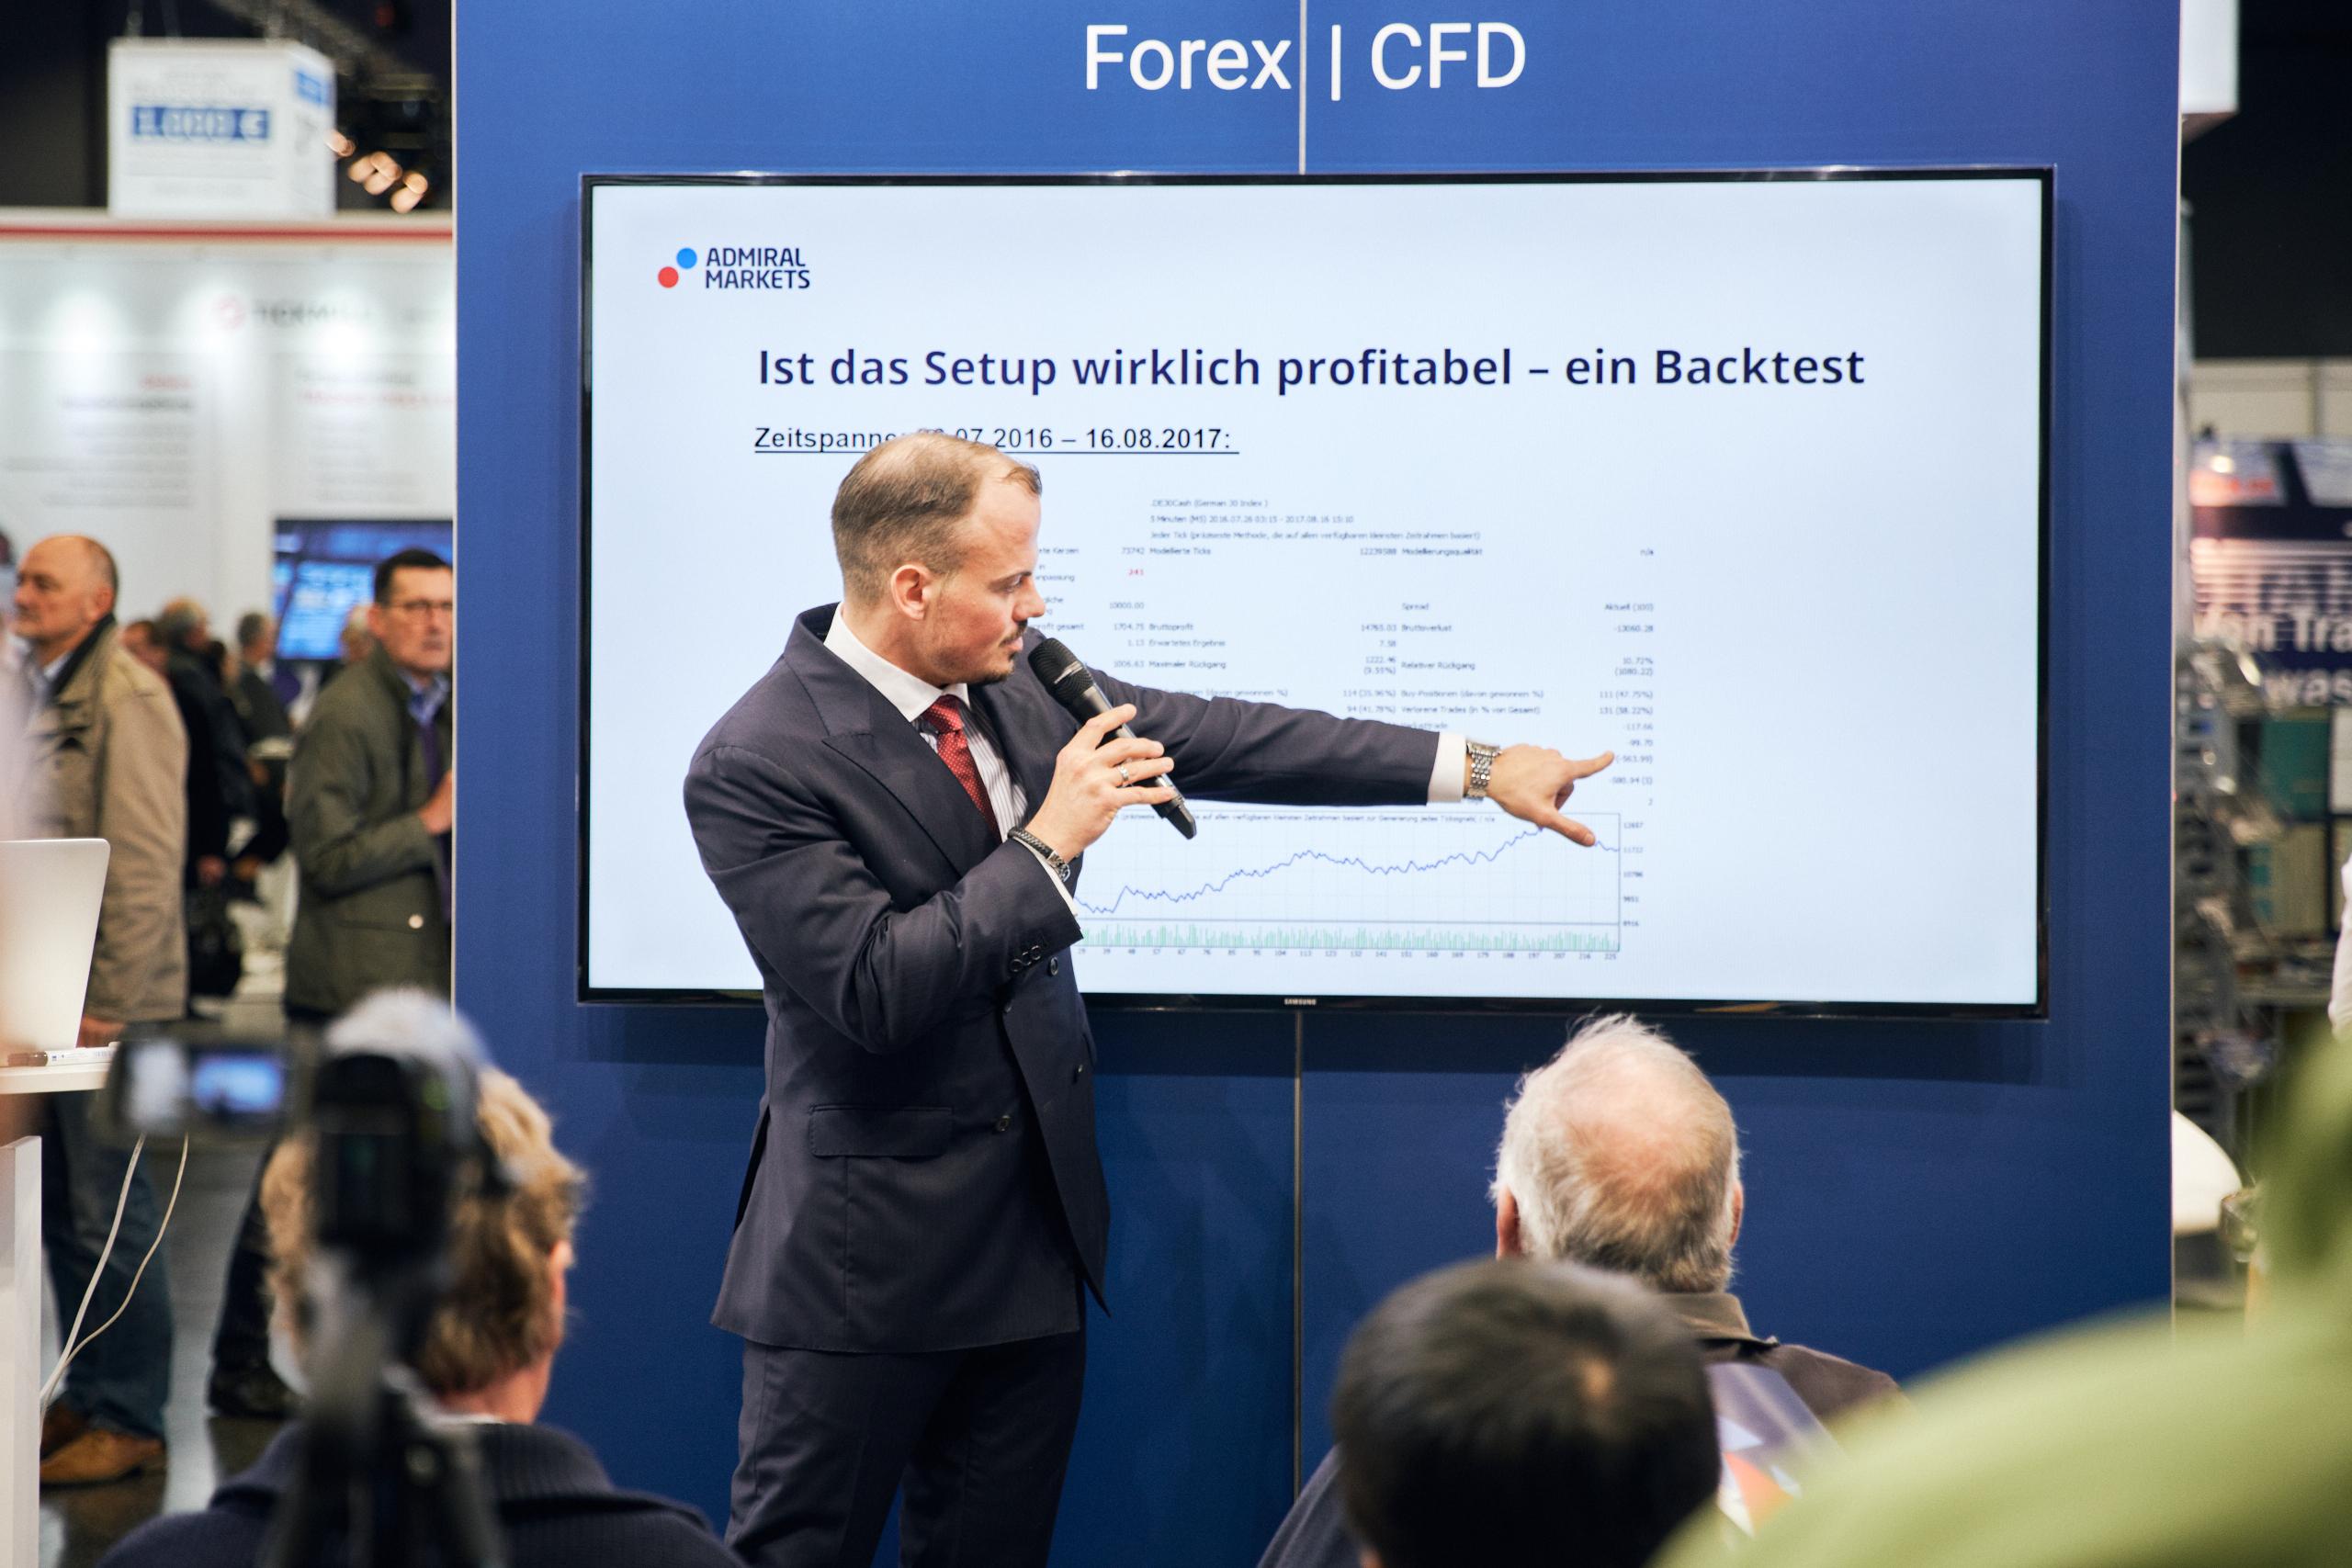 World-of-Trading-2019-Messe-Bericht-vom-Centre-Court-Kommentar-Jens-Chrzanowski-GodmodeTrader.de-2